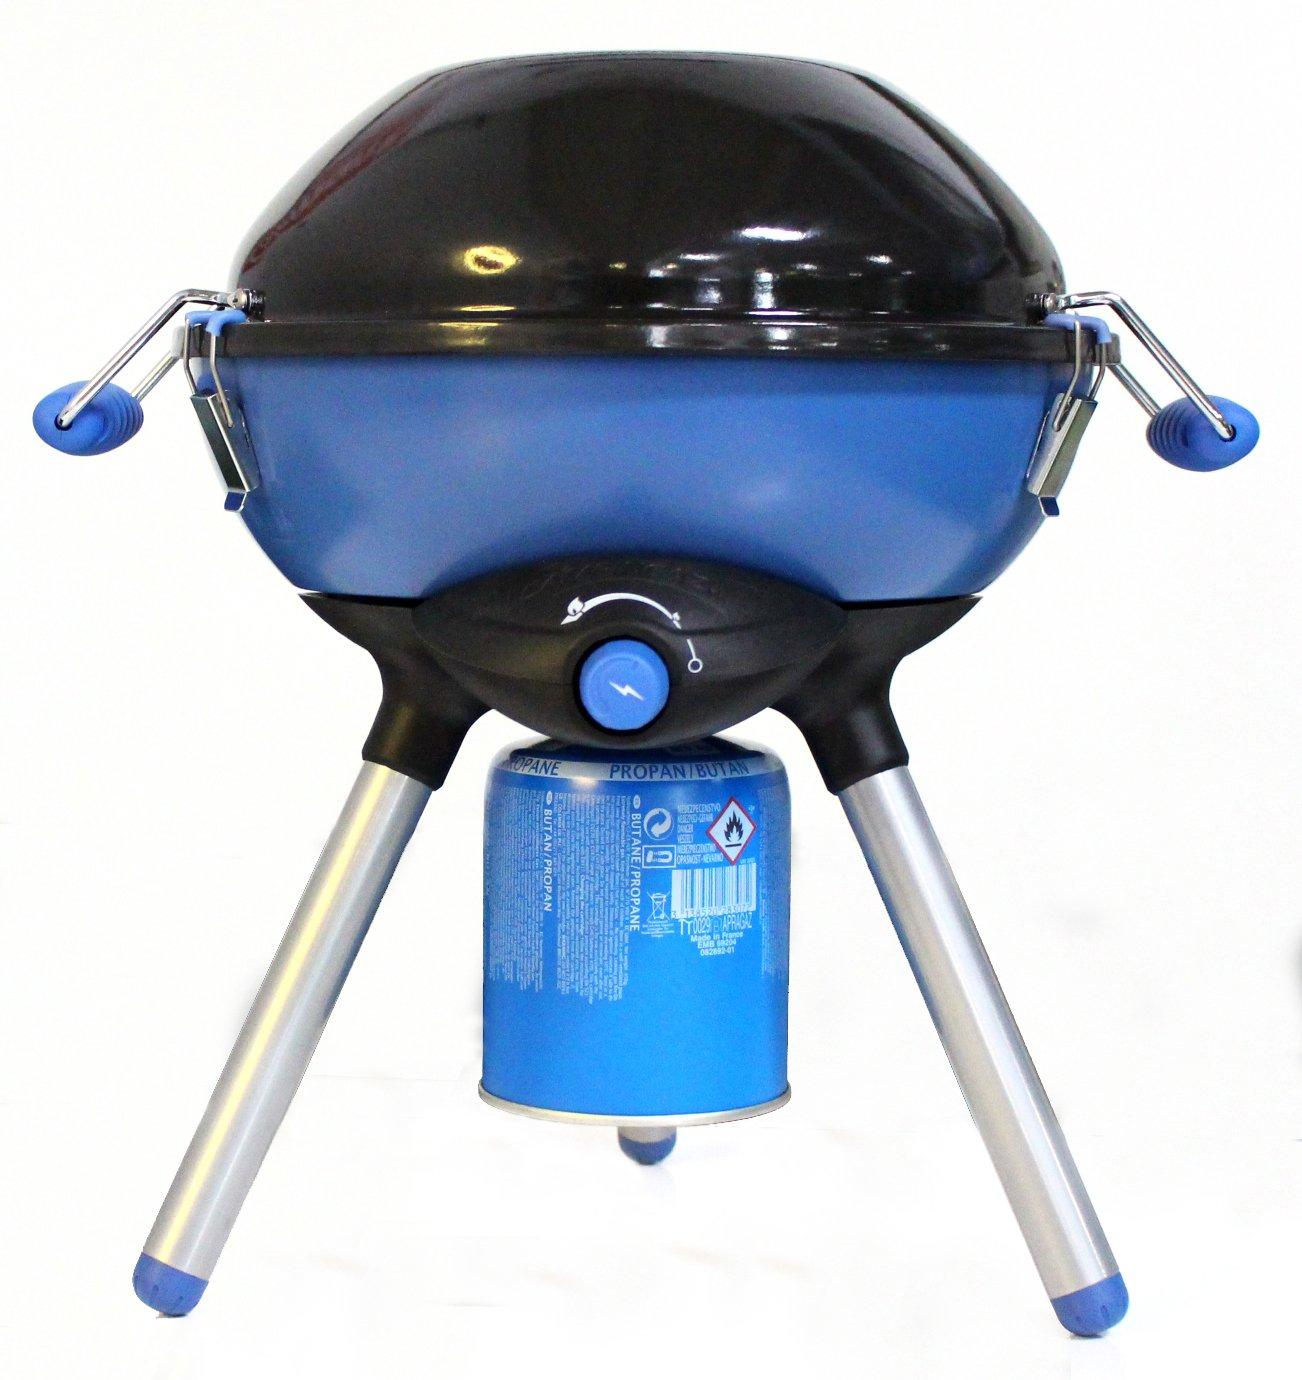 Campingaz Party Grill 400 Camping Stove £30 @ Amazon